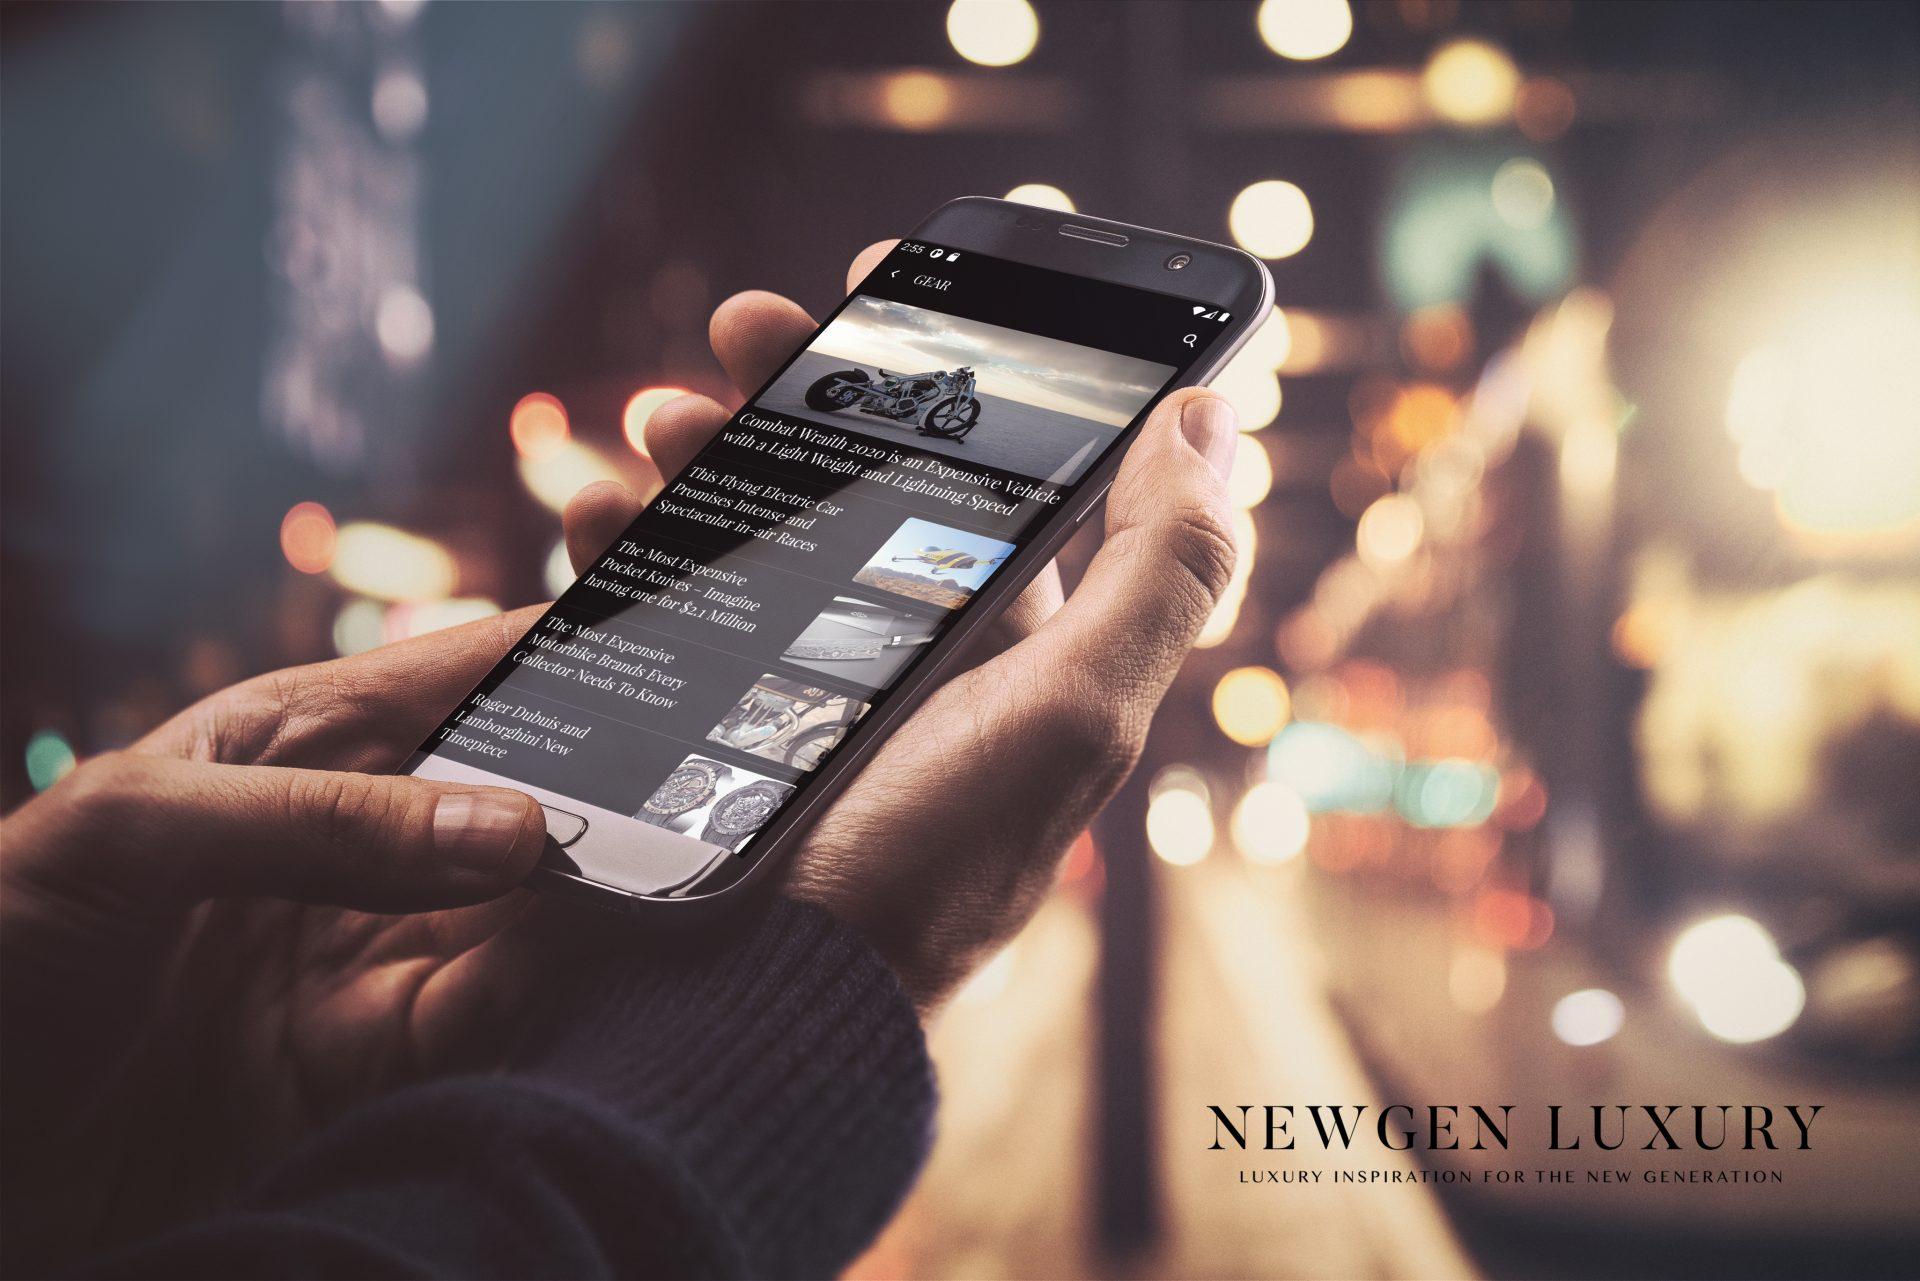 mockup newgen1 – Luxury Magazine Newgen Luxury Android App